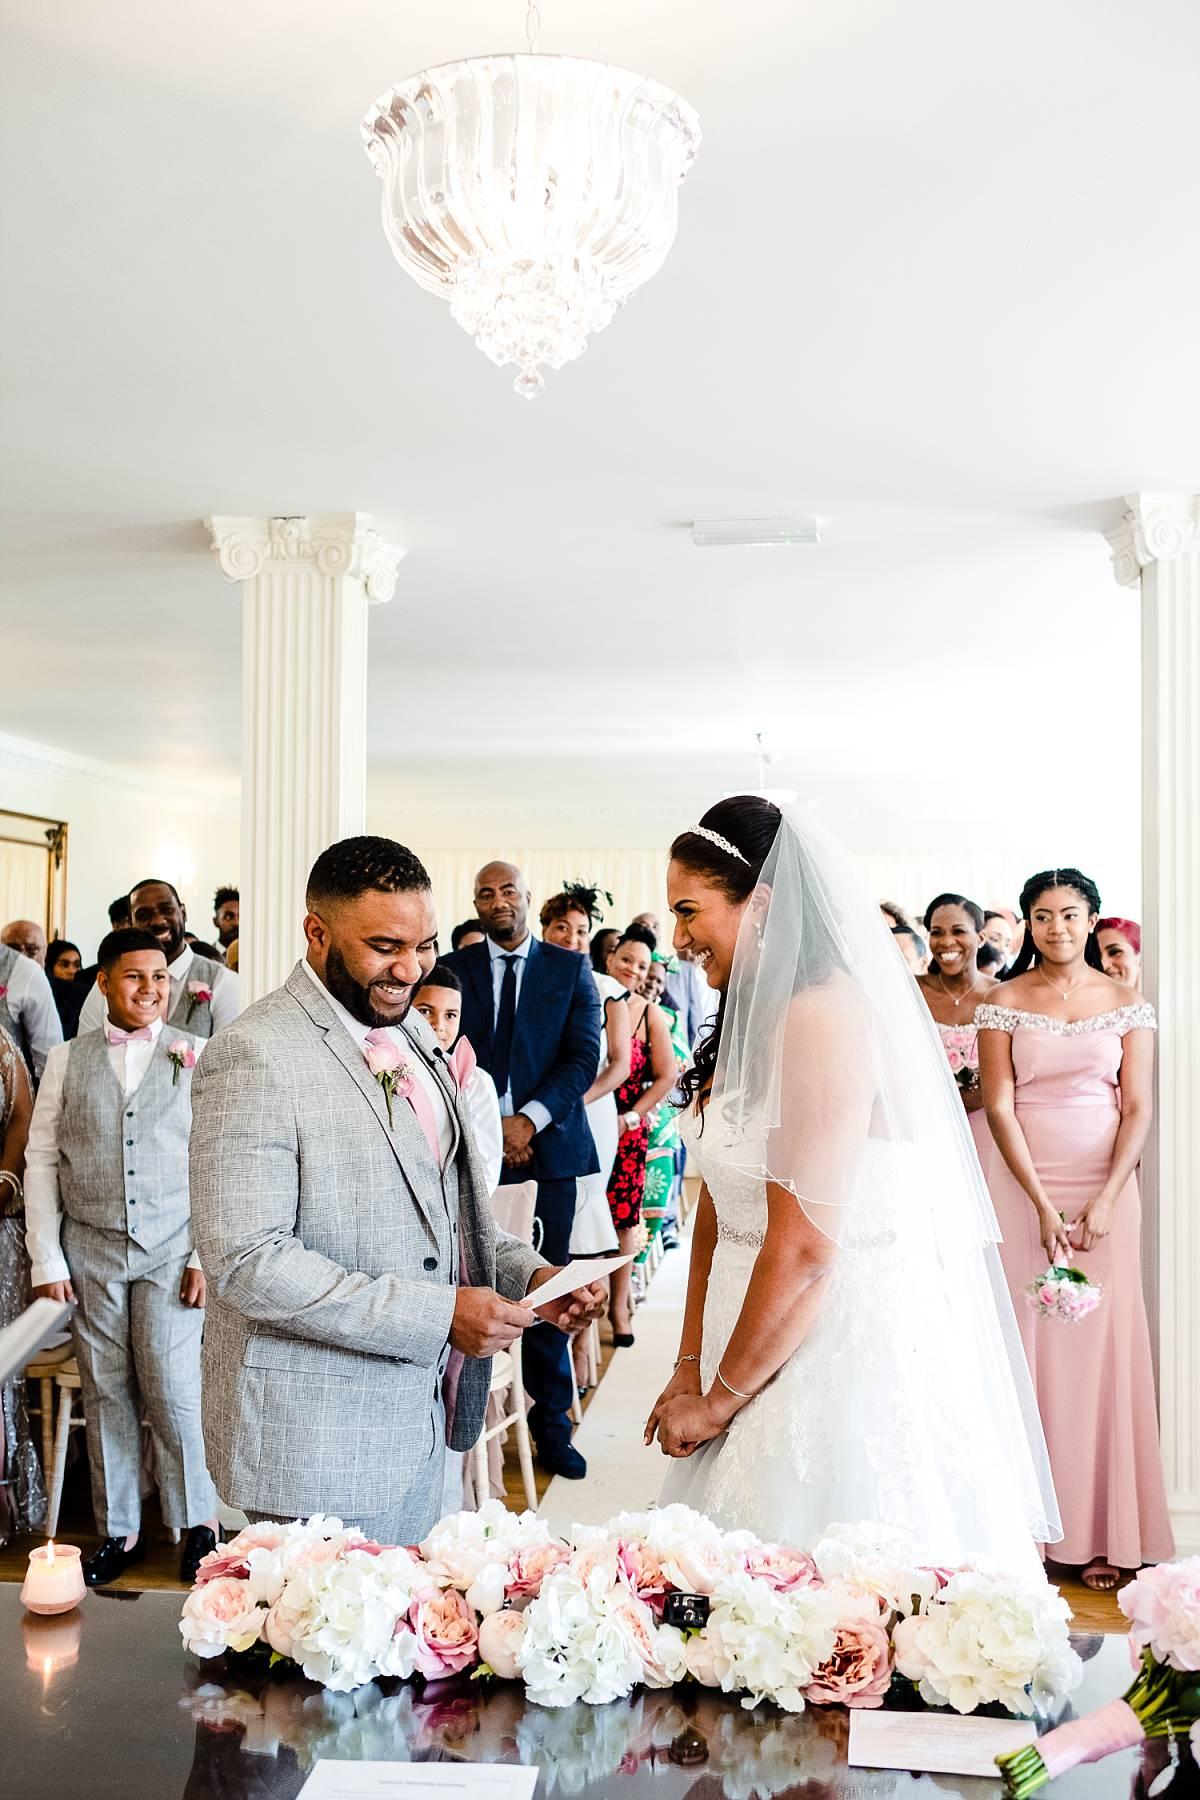 Parklands Quendon Hall Wedding Photography - Ceremony